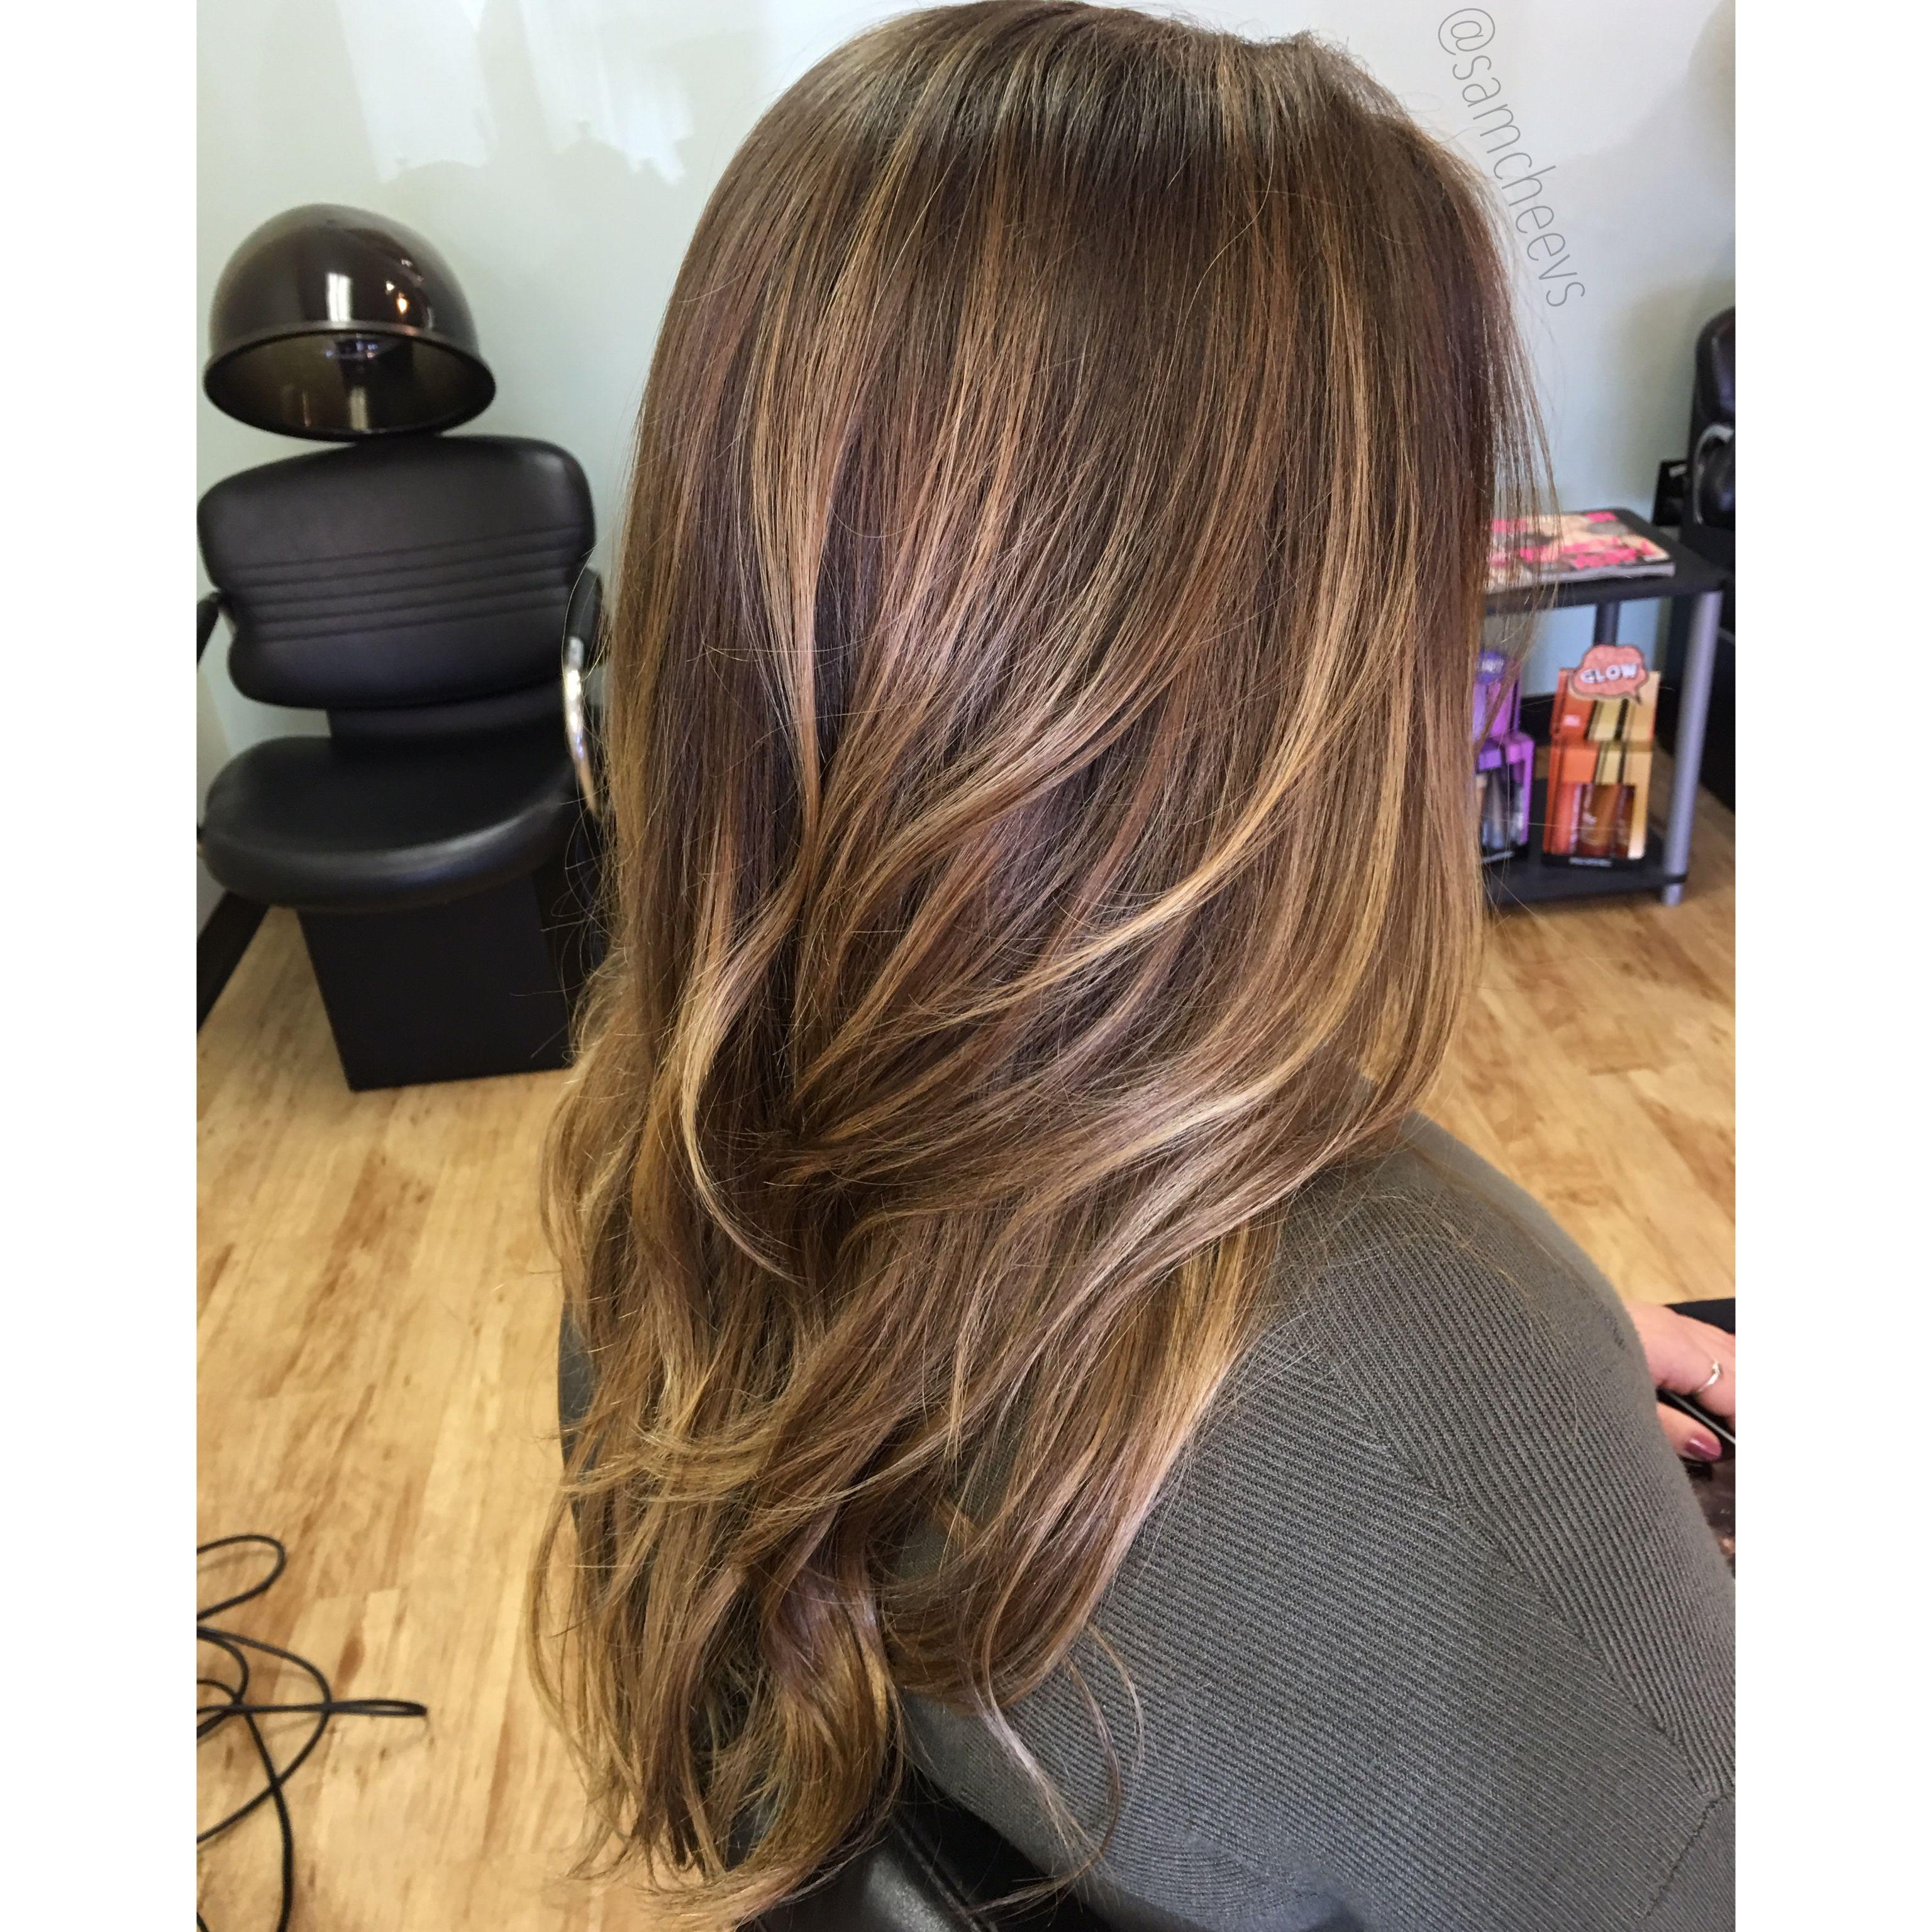 Caramel highlights for dark hair balayage for brown hair types caramel highlights for dark hair balayage for brown hair types brunette hair pmusecretfo Choice Image